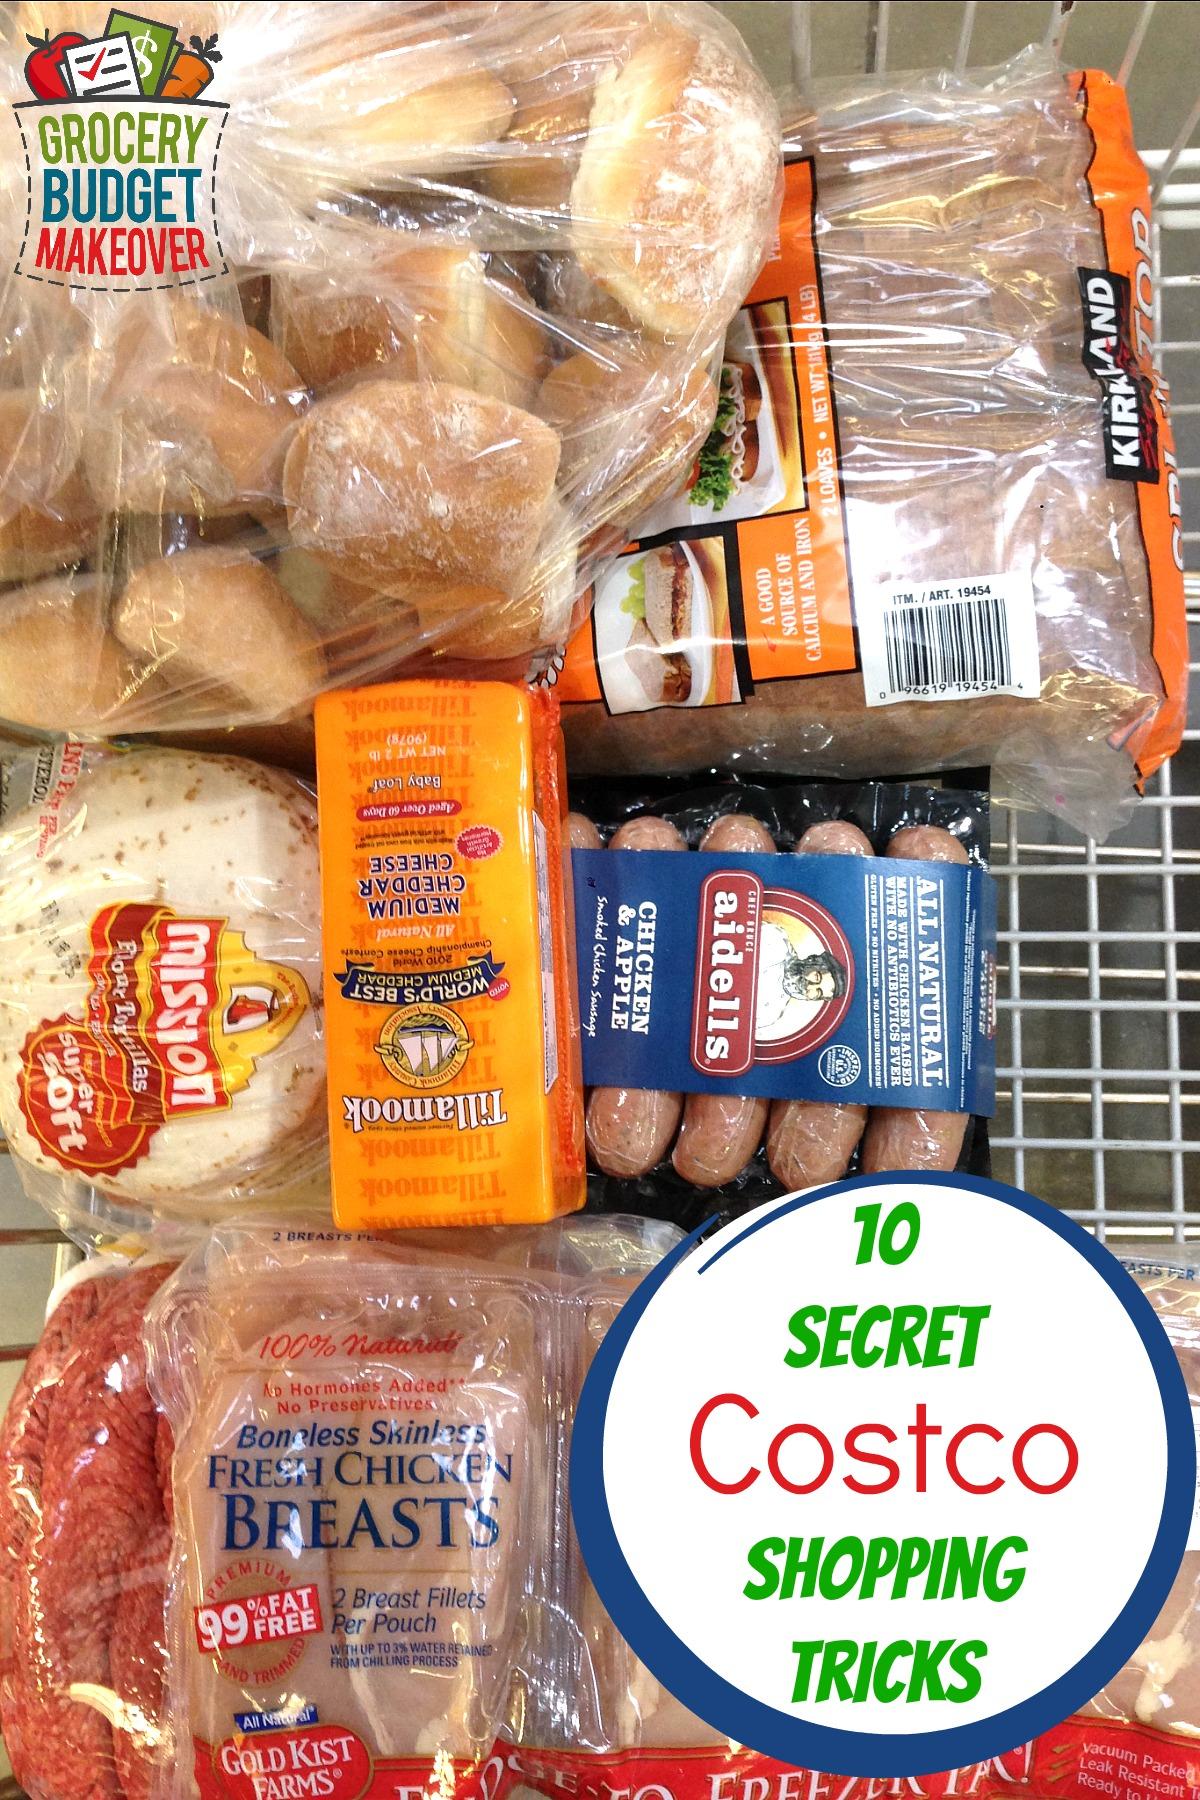 10 Secret Costco Shopping Tricks